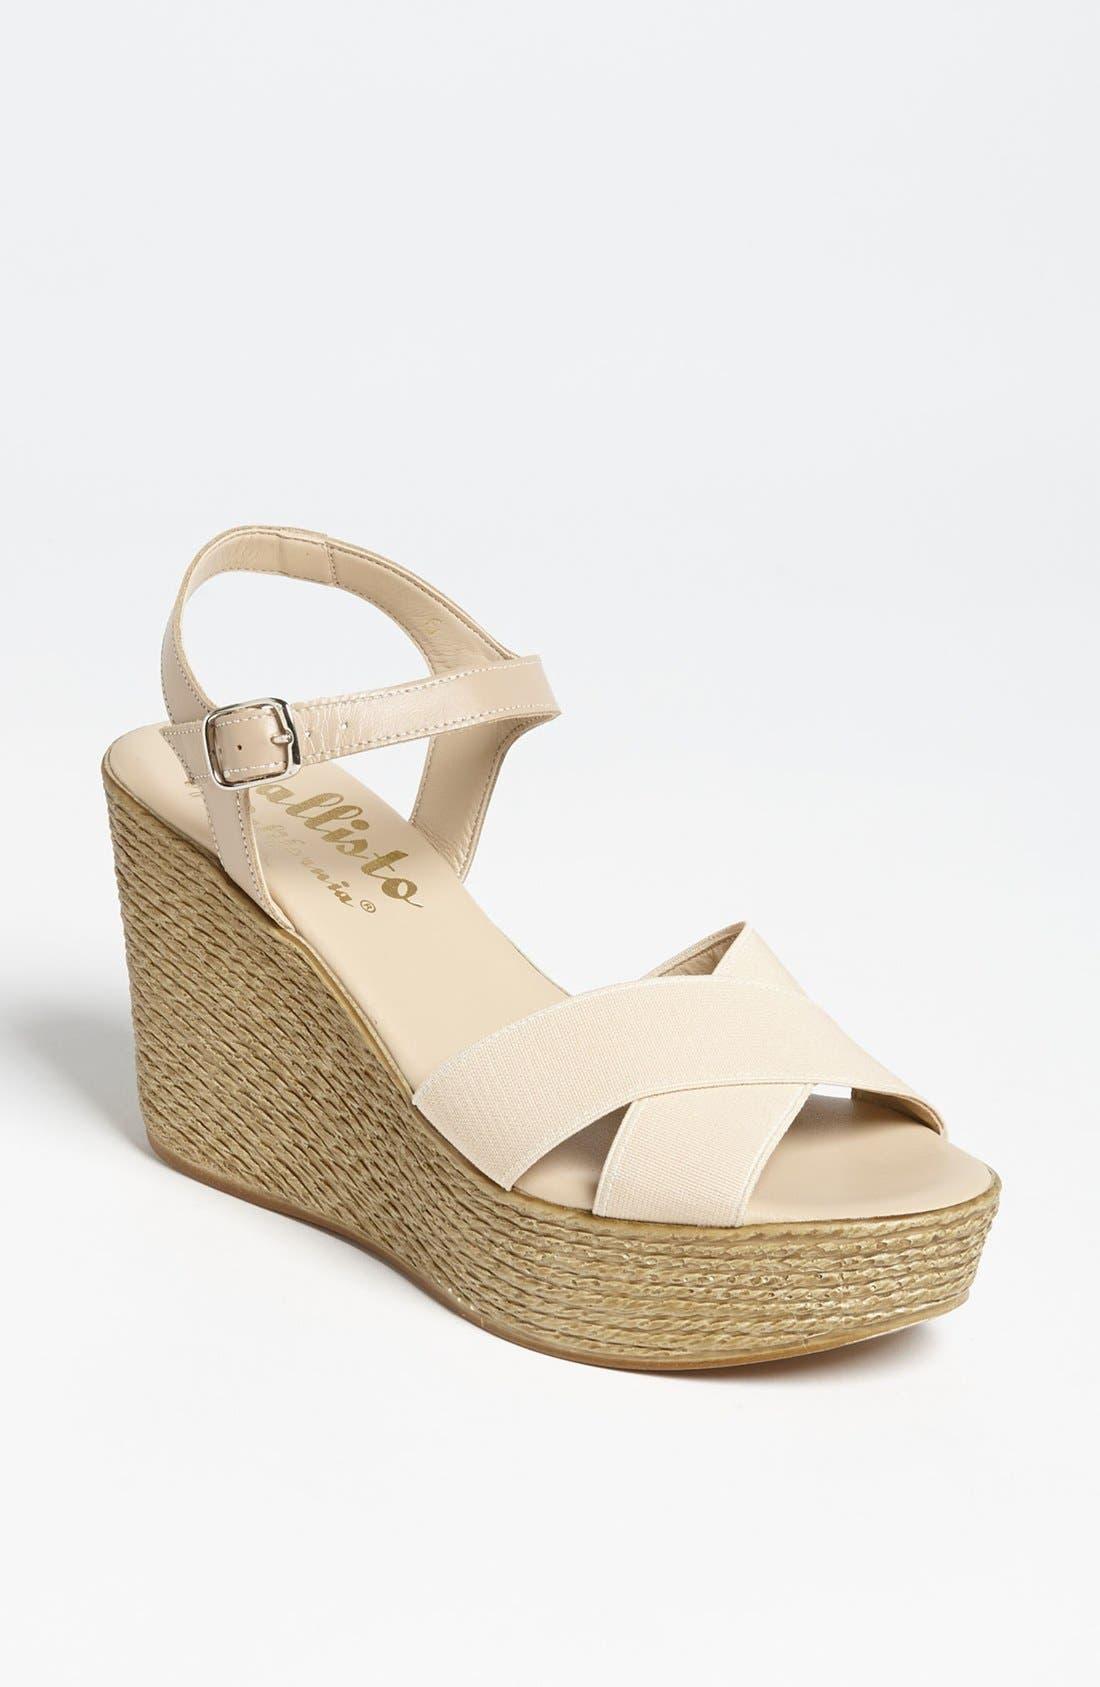 Alternate Image 1 Selected - Callisto 'Olivia' Wedge Sandal